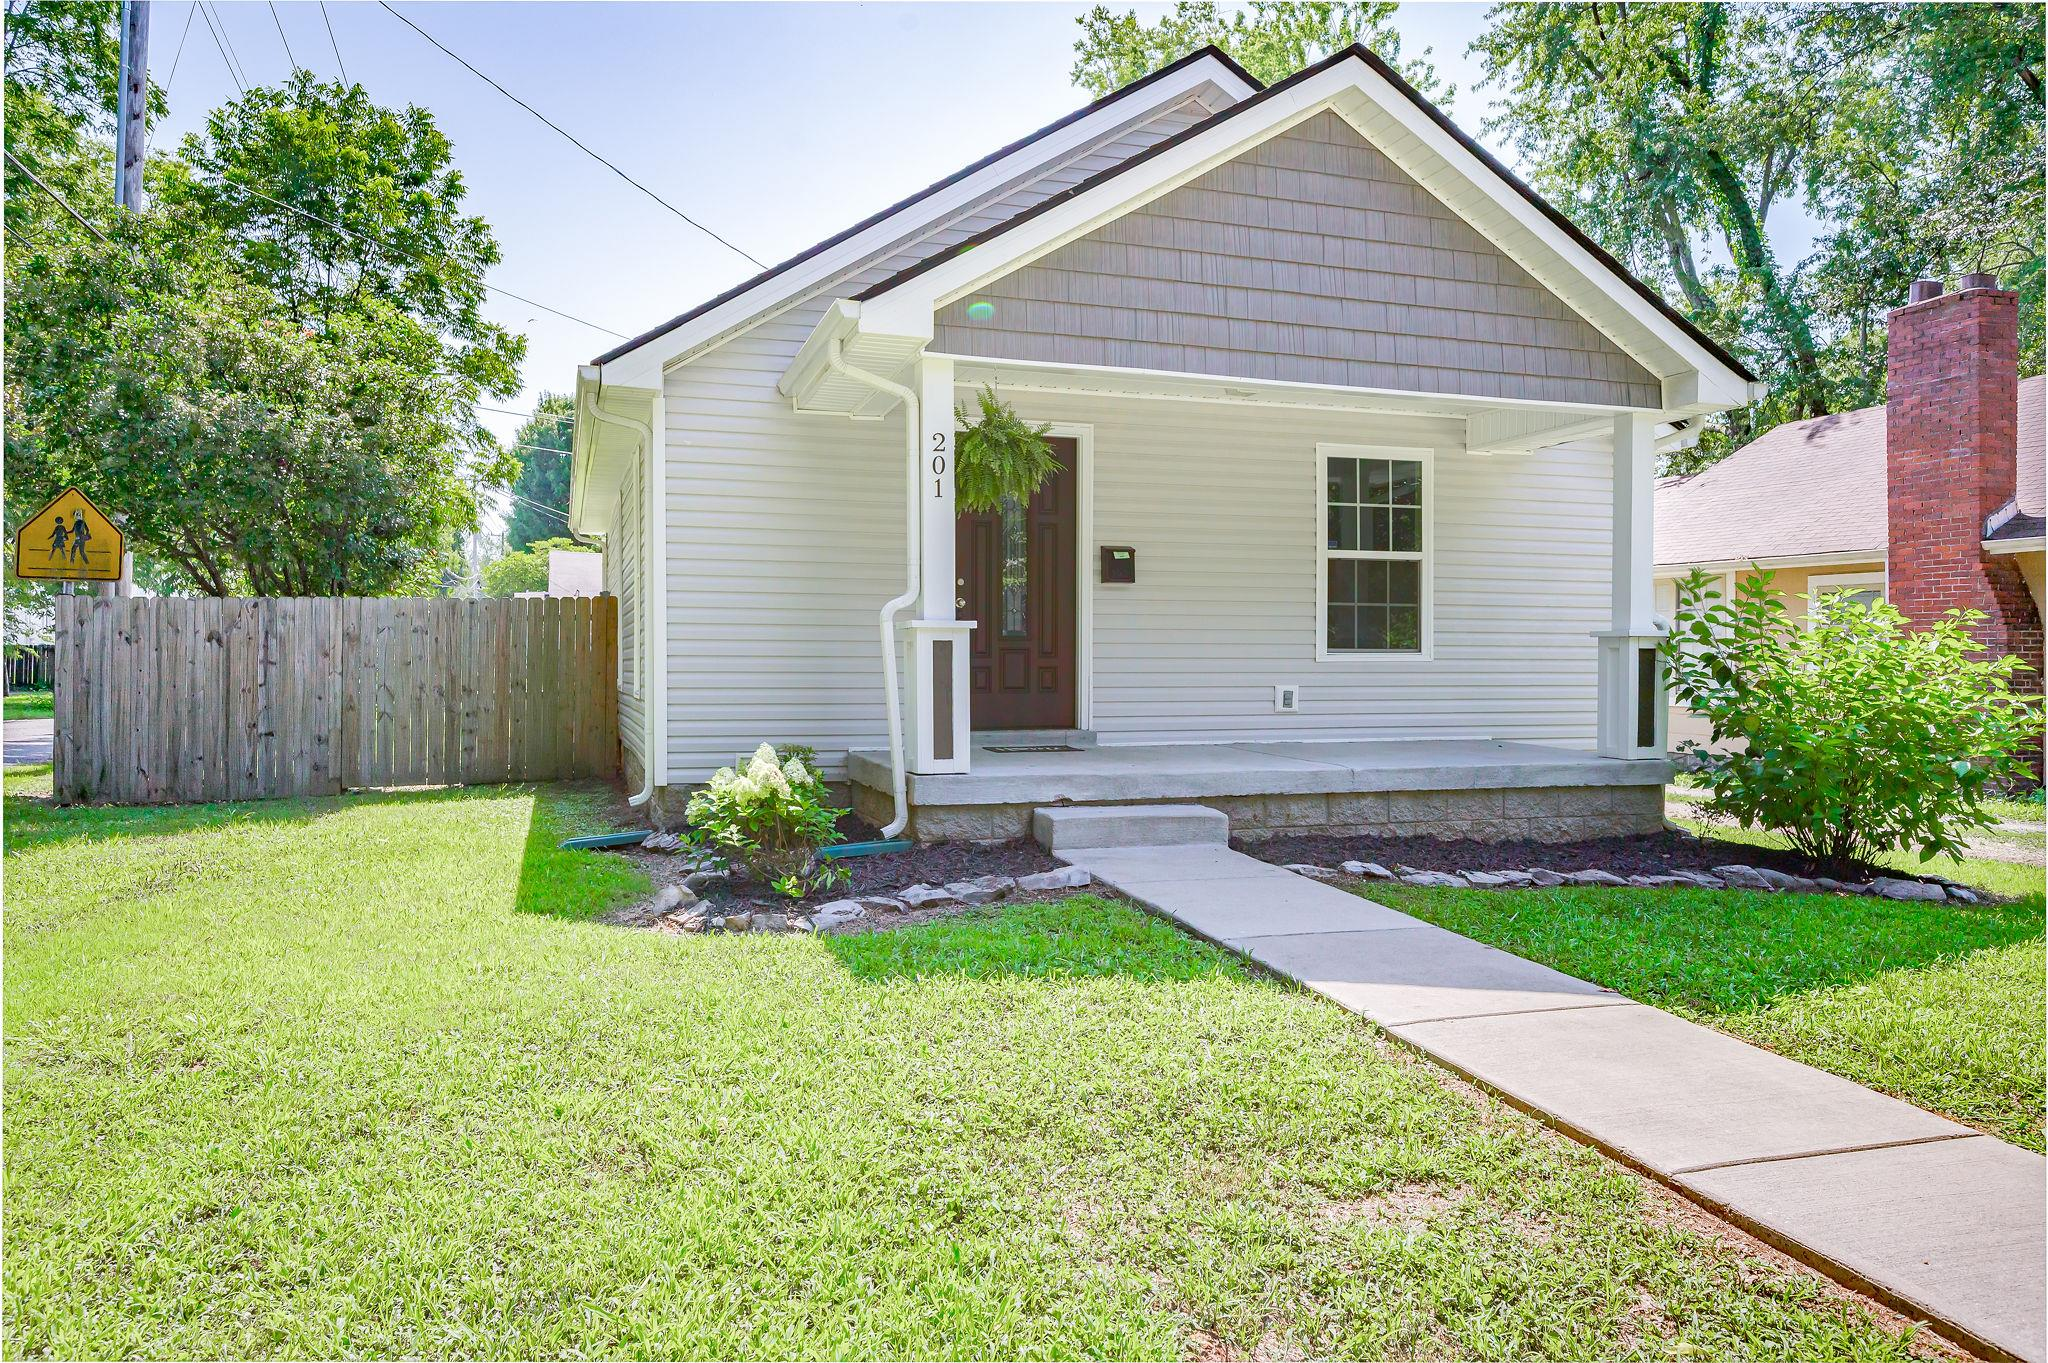 201 Kerr Ave, Murfreesboro, TN 37130 - Murfreesboro, TN real estate listing